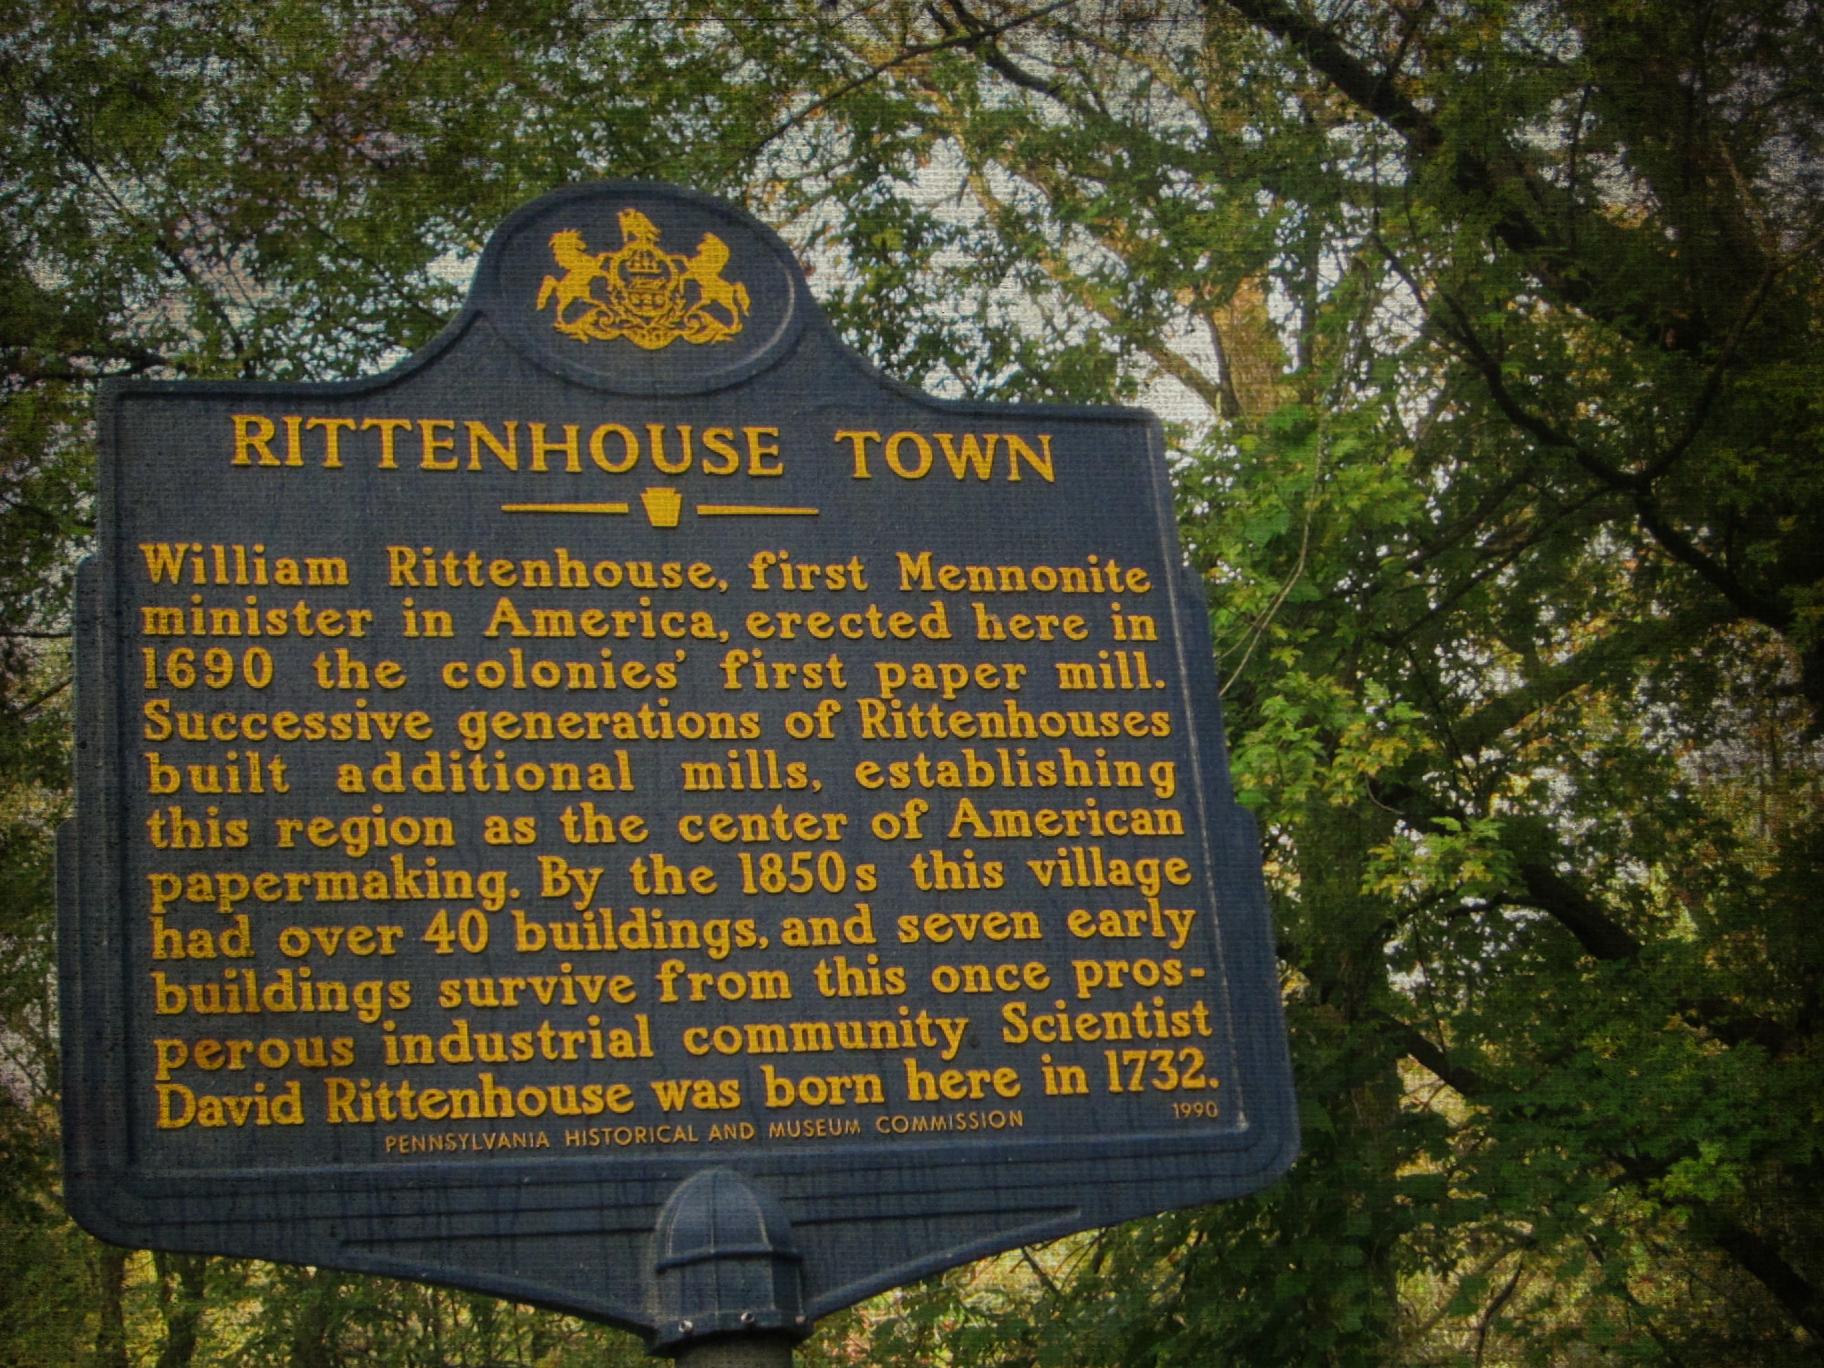 Rittenhousetown blue sign PM spooky